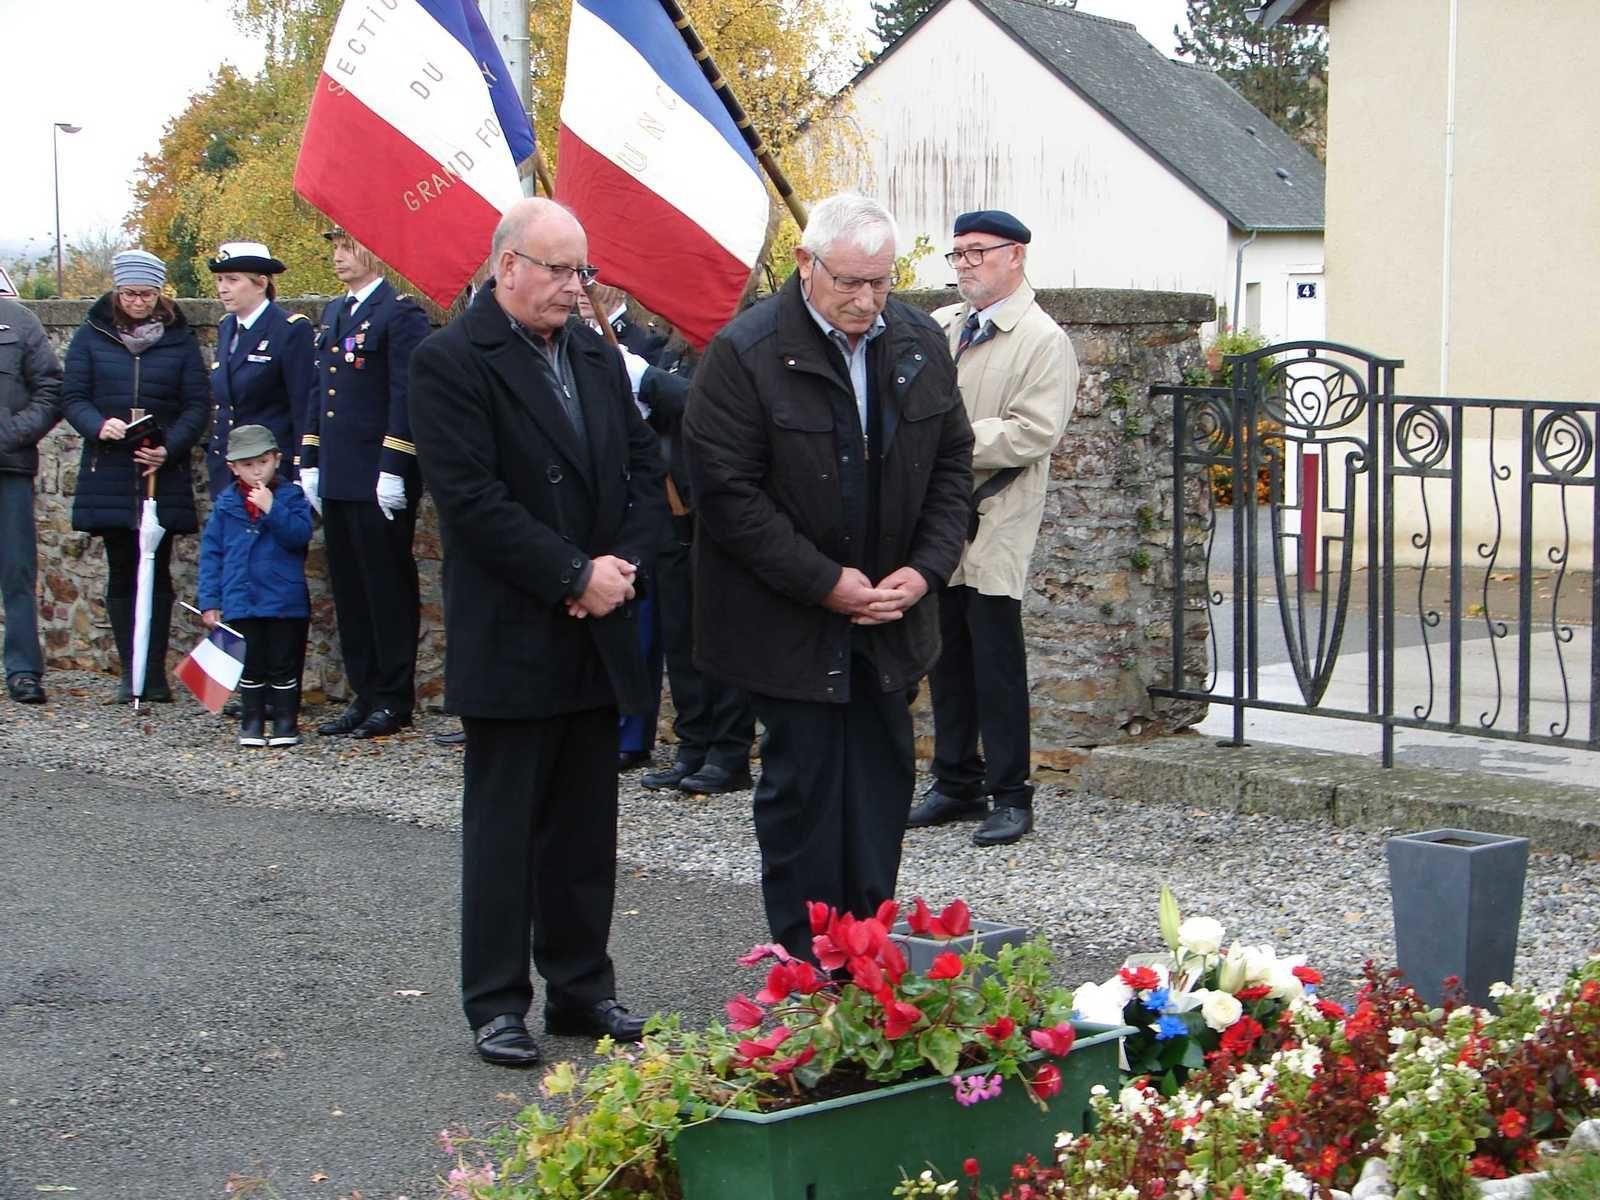 Le 11 novembre au Grand-Fougeray